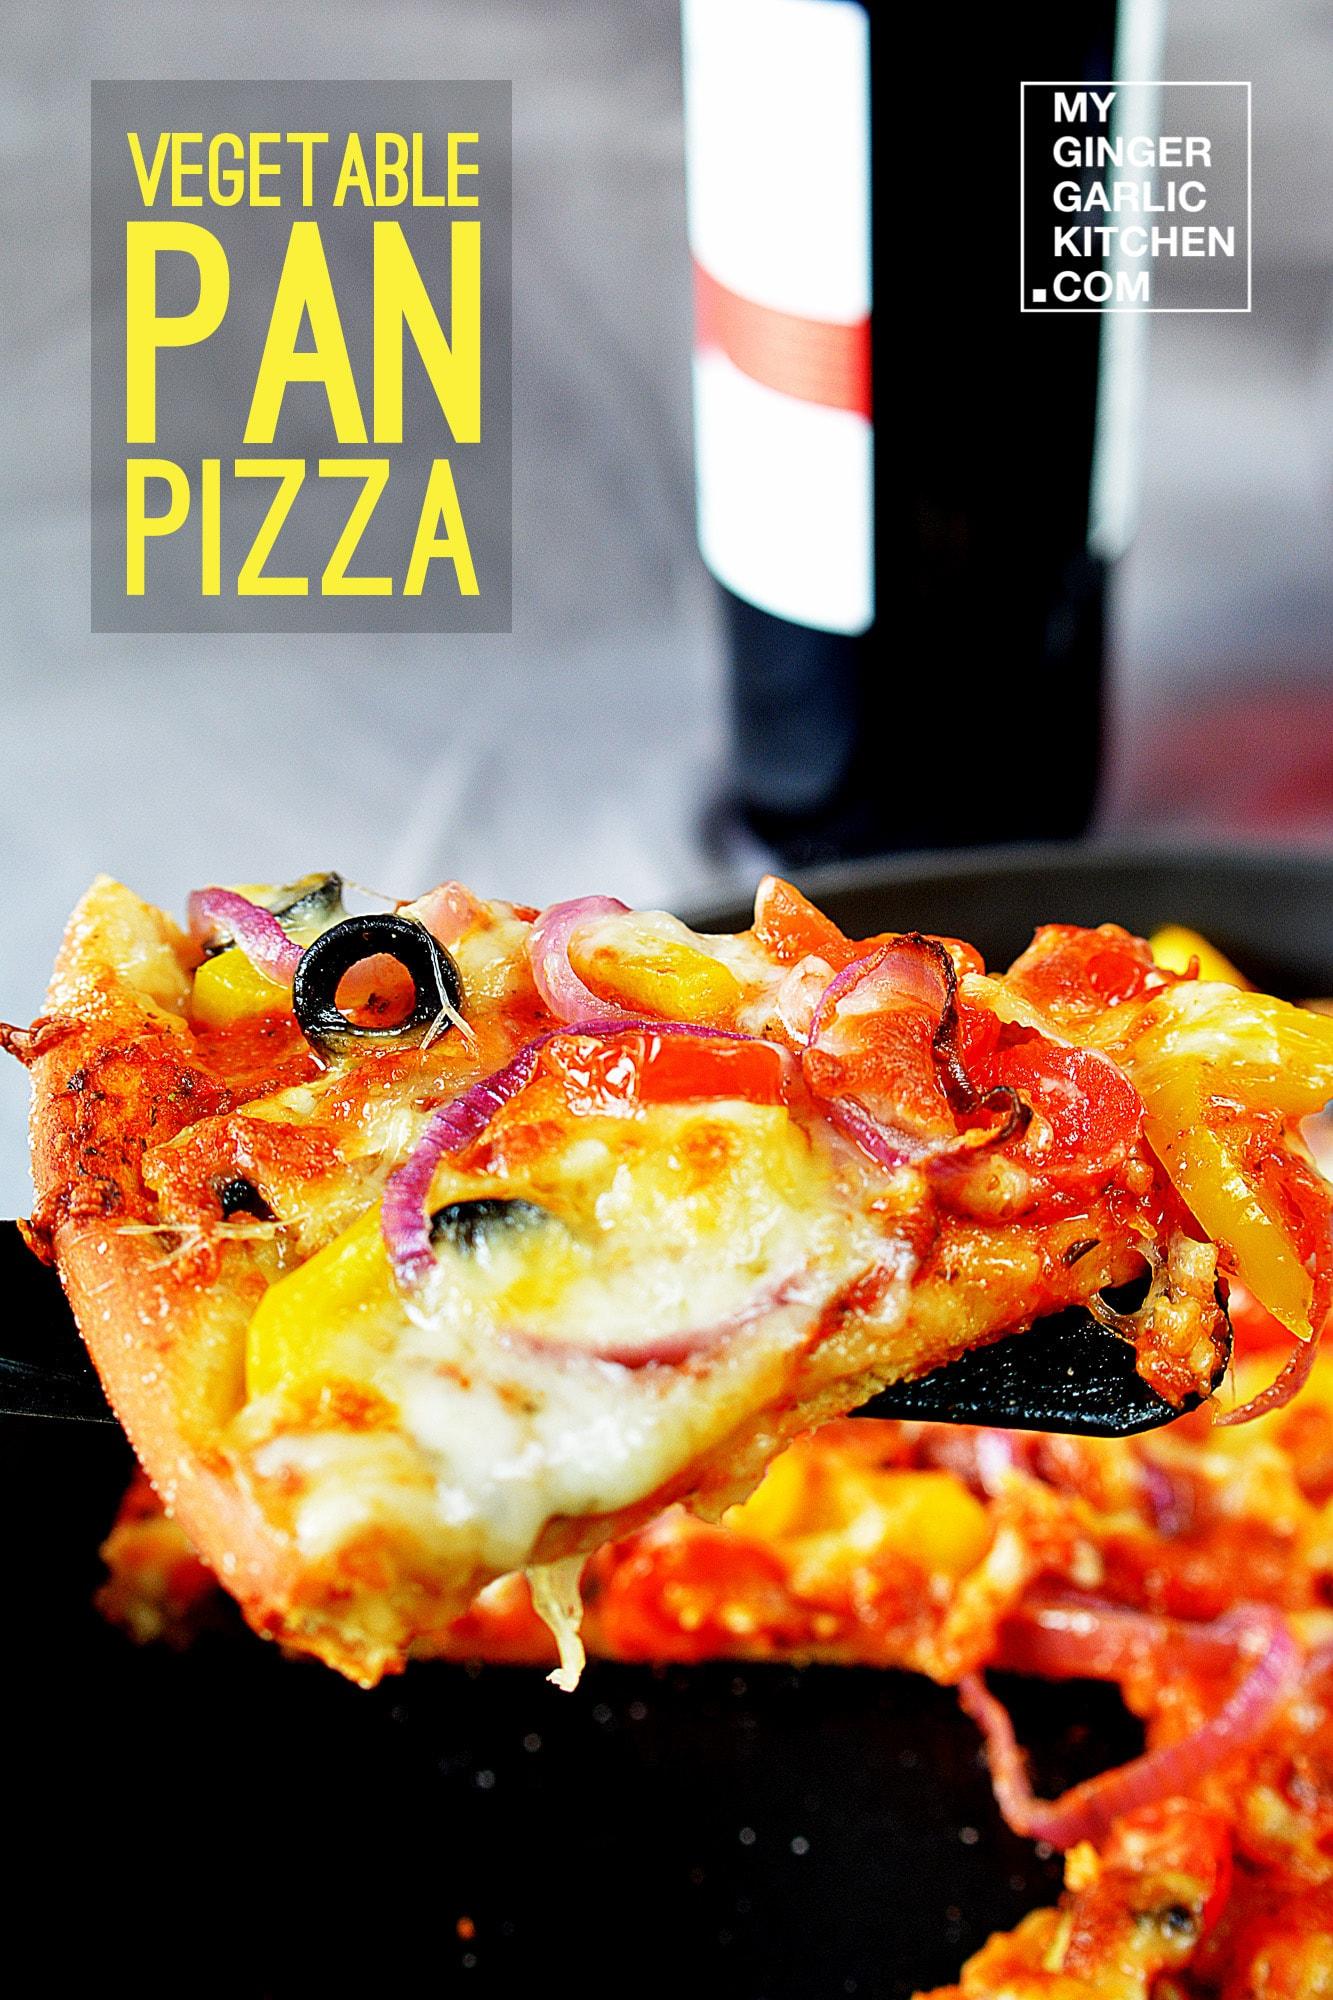 Image - recipe vegetable pan pizza anupama paliwal my ginger garlic kitchen 3 copy